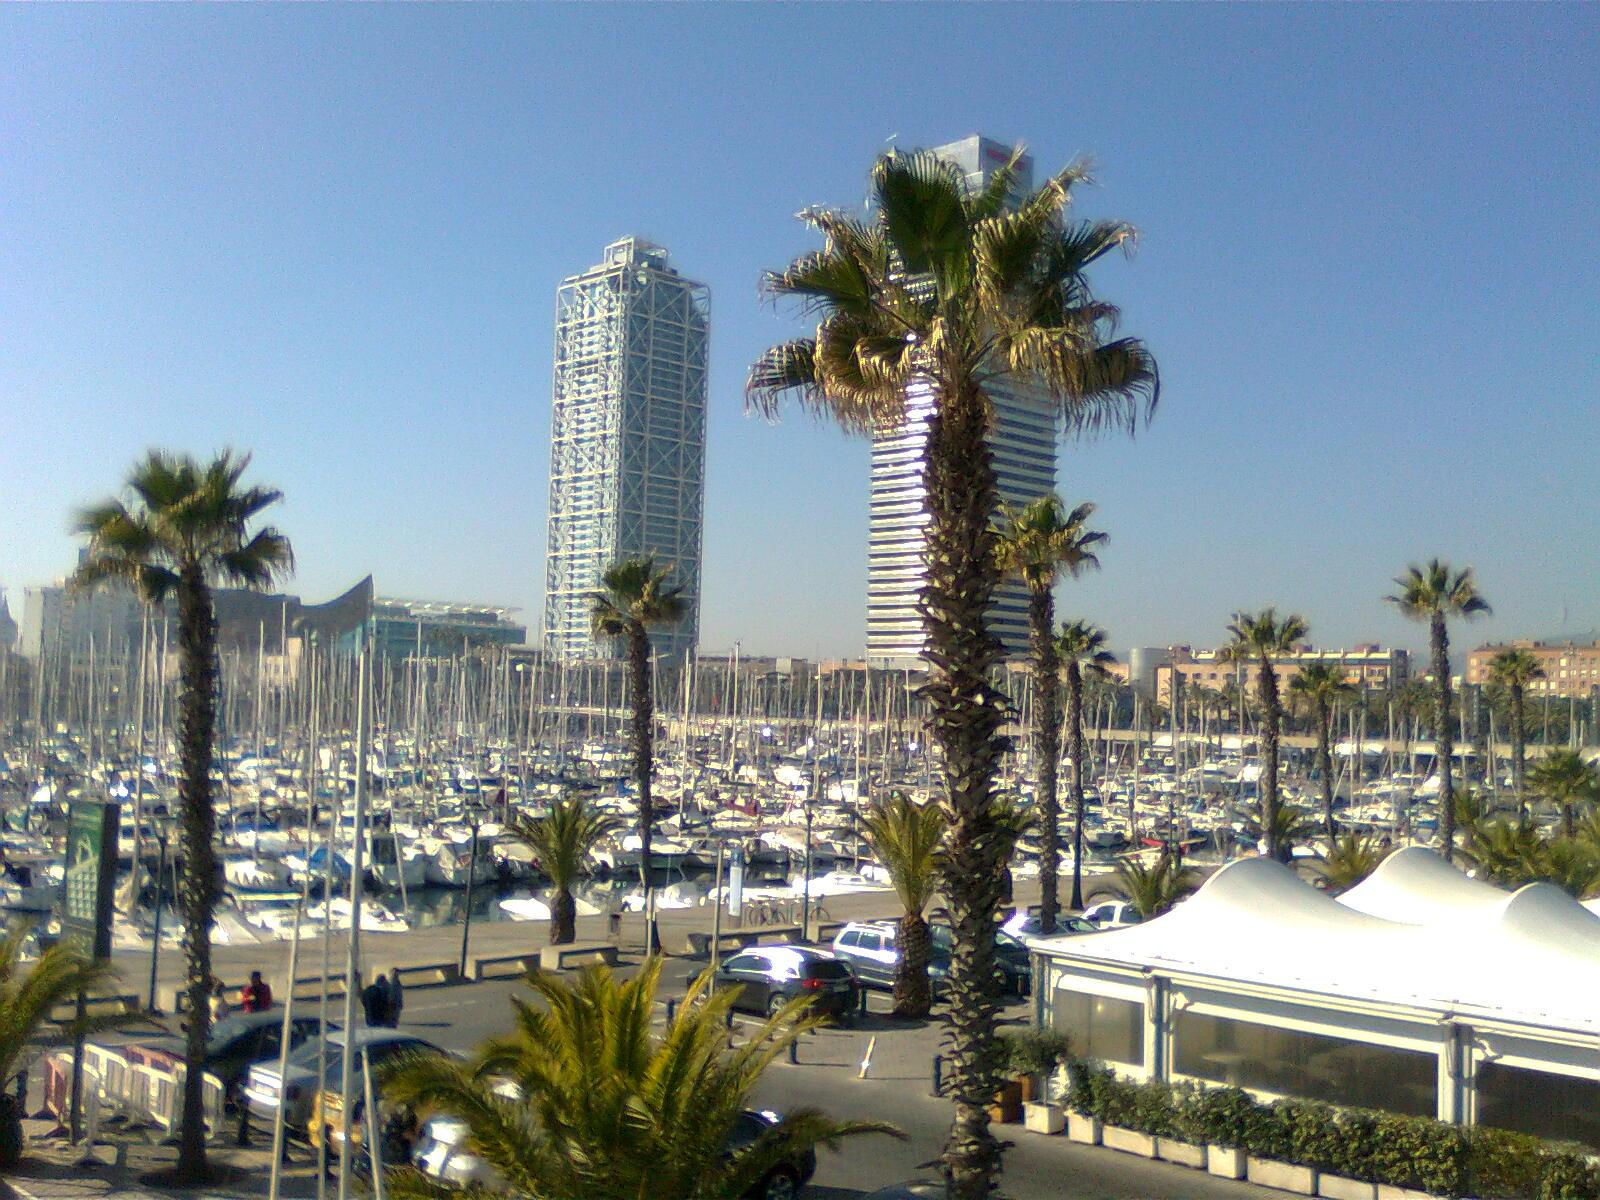 Le port olympique barcelone shbarcelona blog voyage de barcelone - Port de plaisance barcelone ...